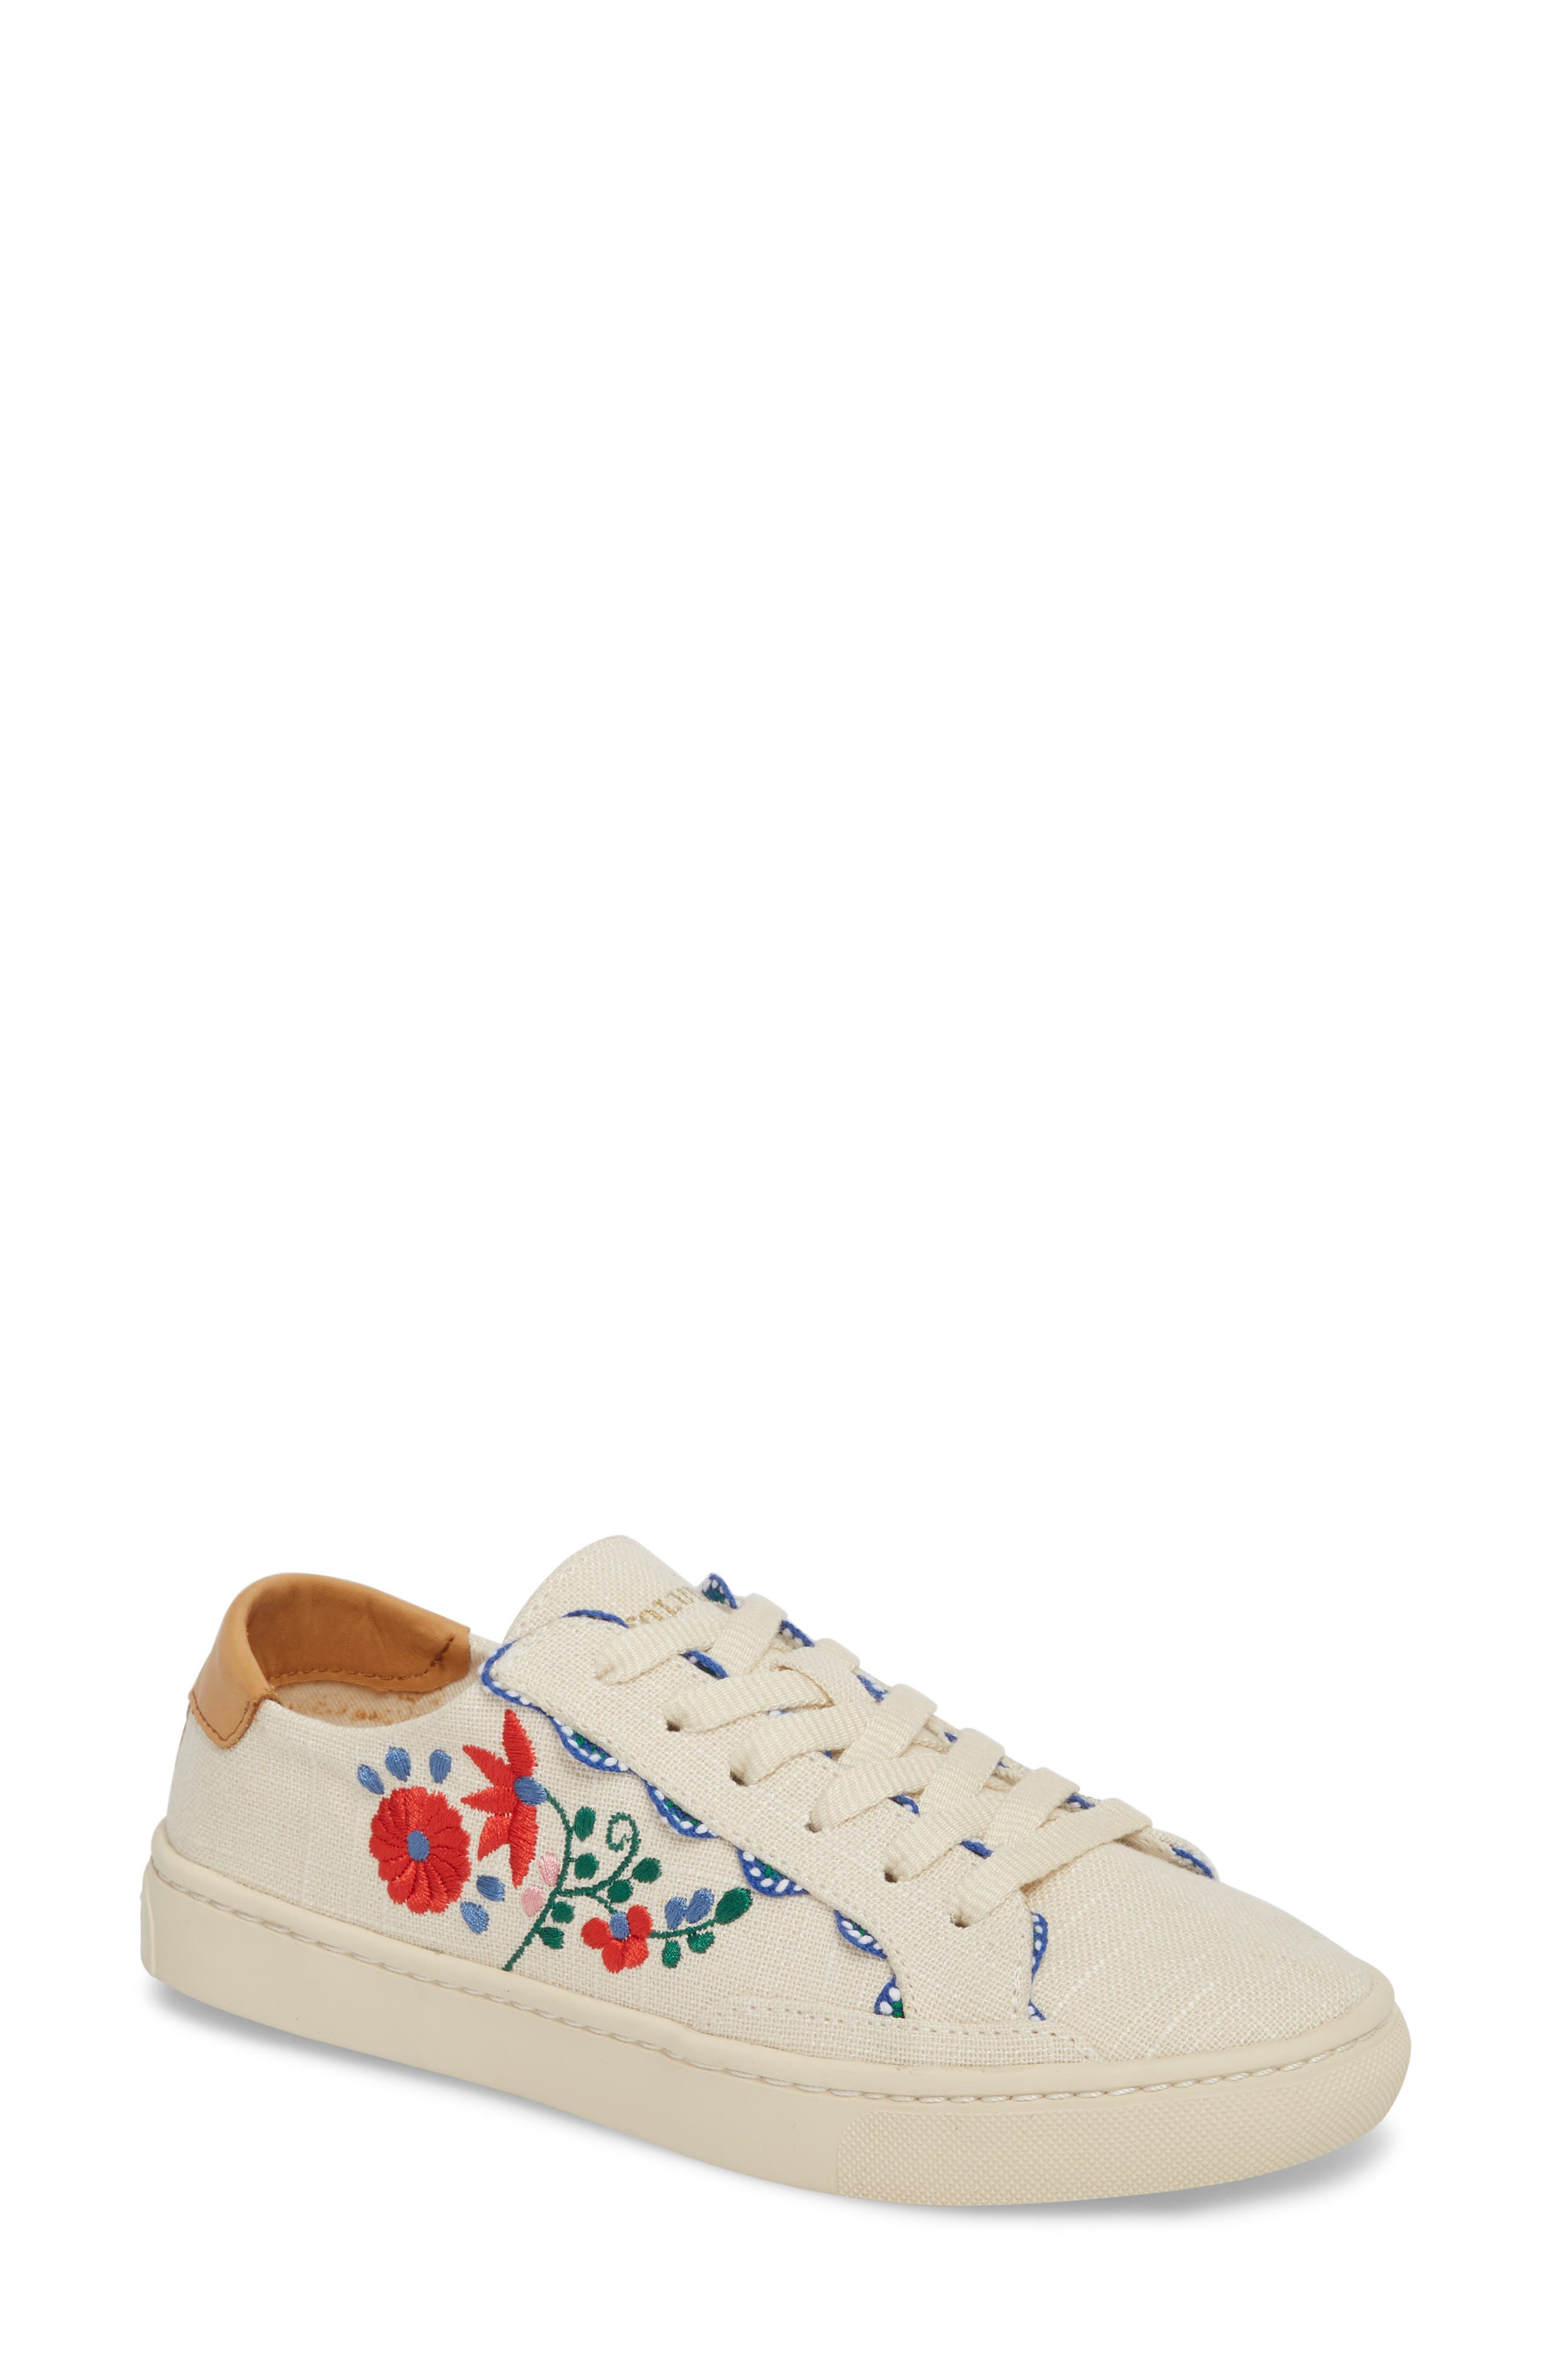 Ibiza Embroidered Sneaker,                             Main thumbnail 1, color,                             680